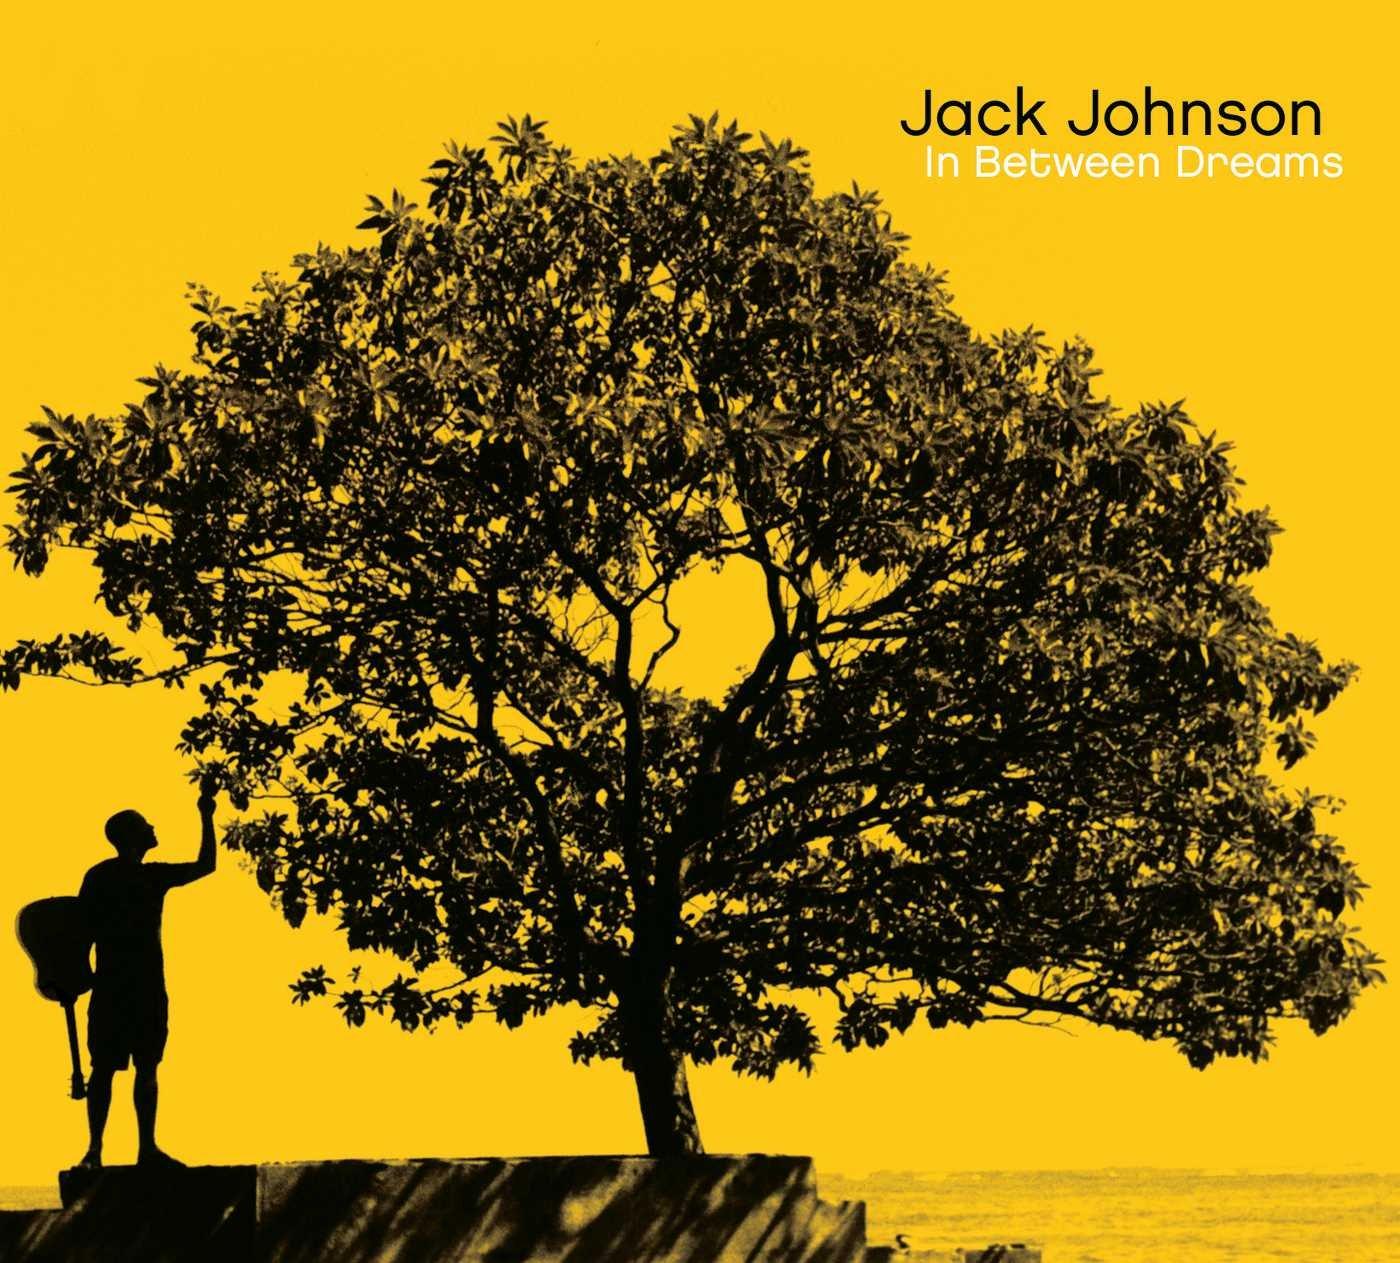 Jack Johnson - In Between Dreams - Amazon.com Music